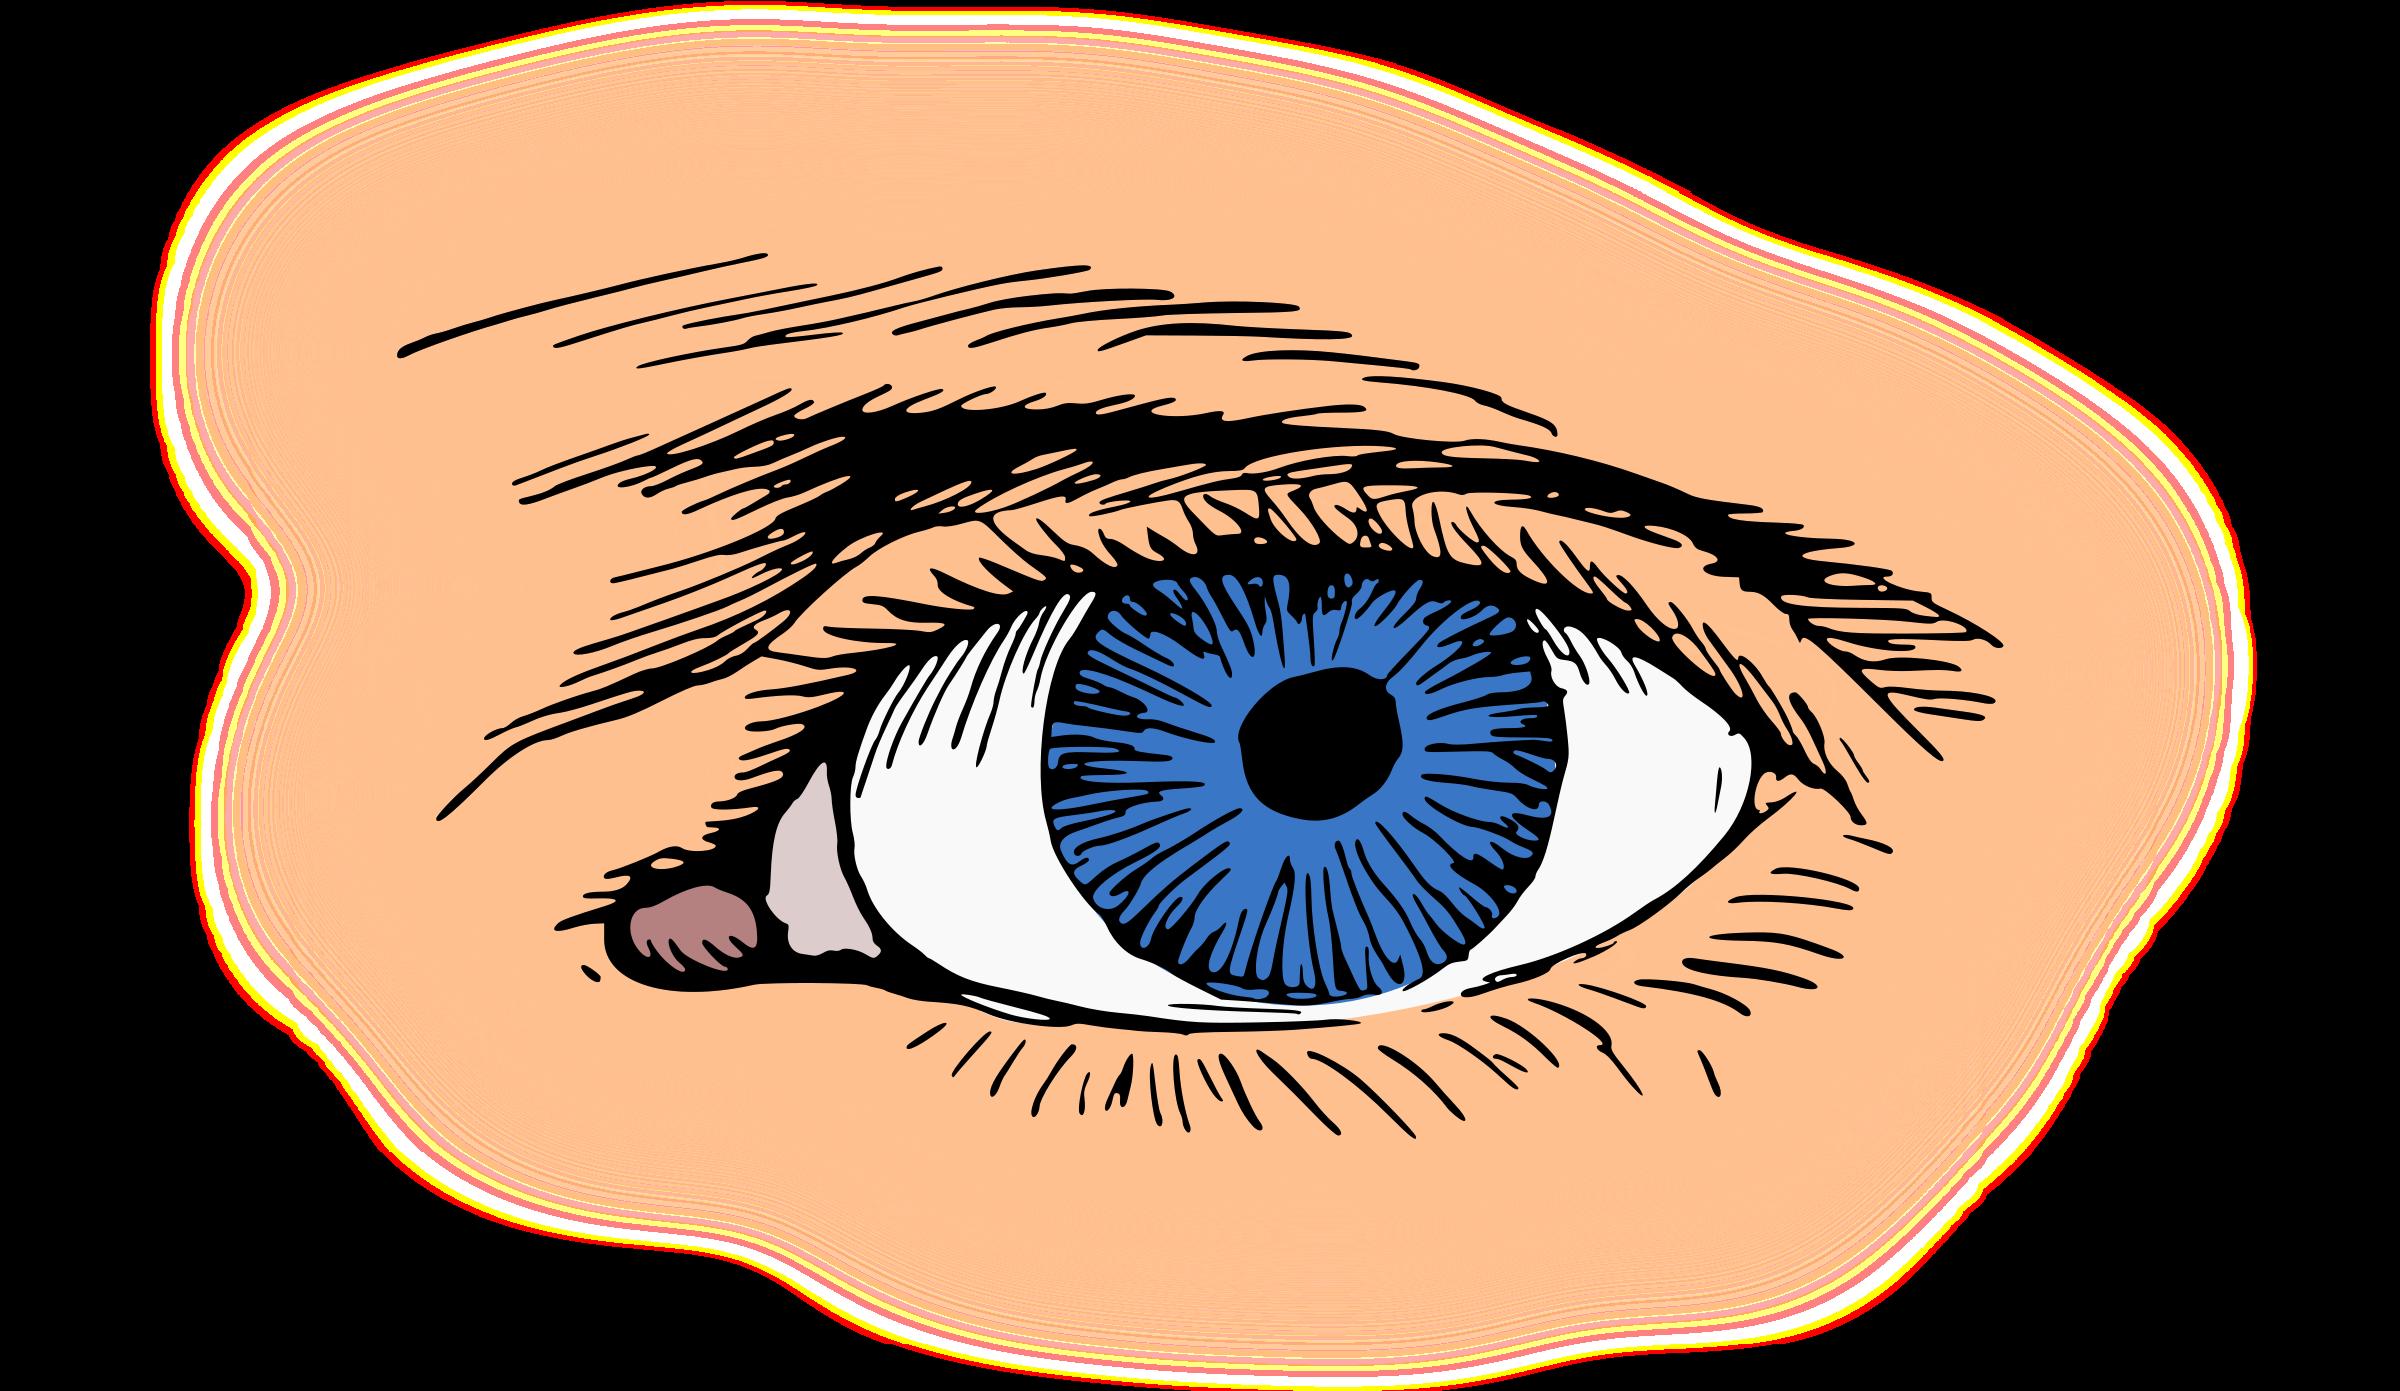 Vision clipart human eye. Brown eyes shop of